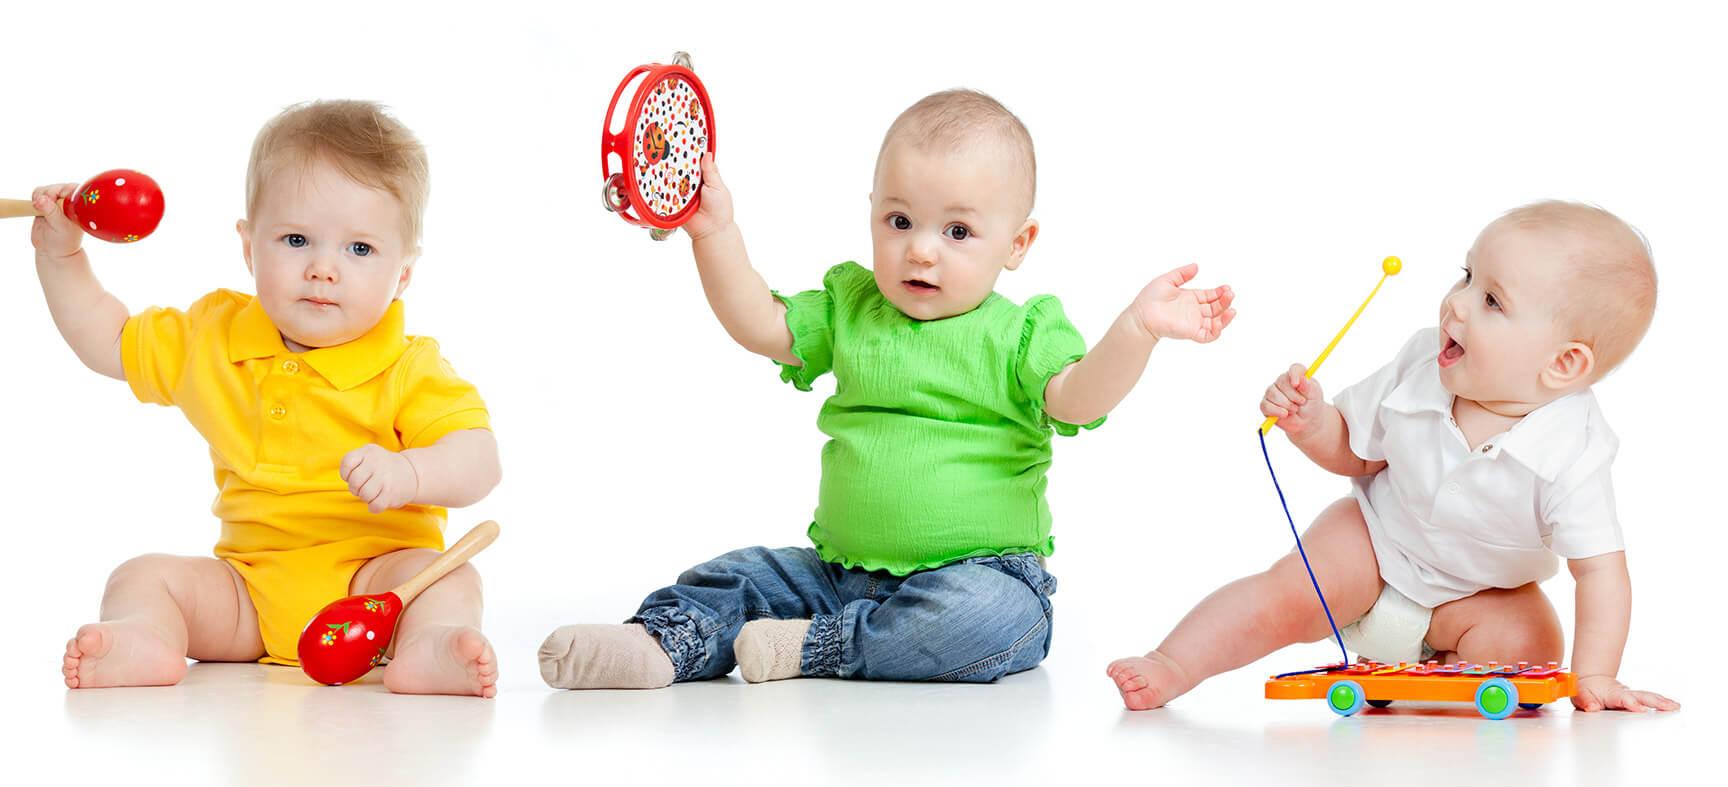 Childhood Illnesses: Gastroenteritis